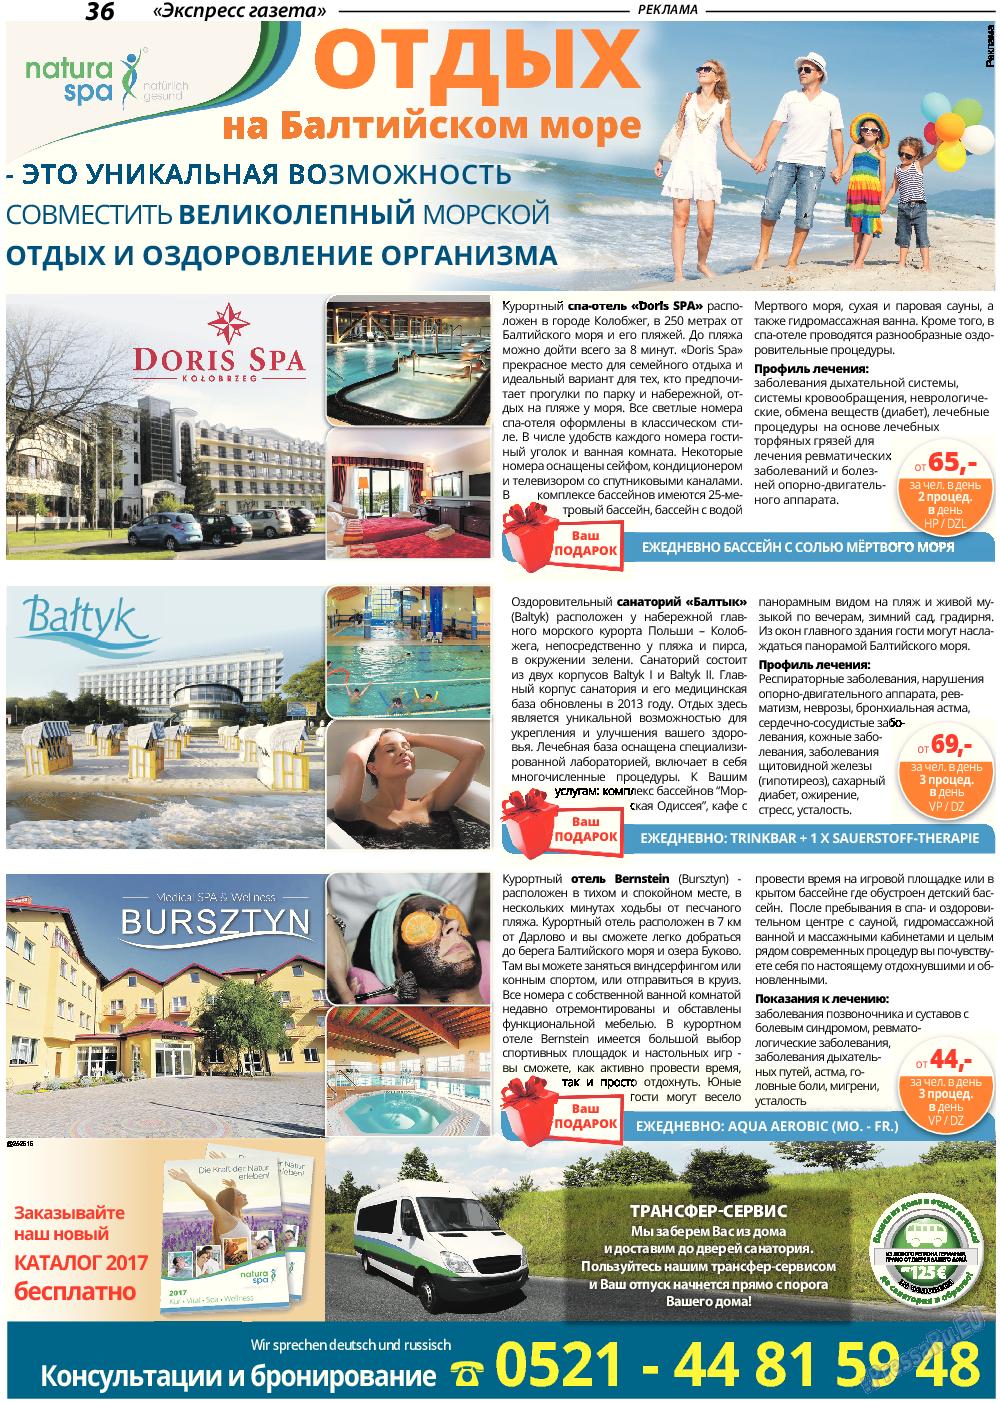 Экспресс газета (газета). 2017 год, номер 8, стр. 36